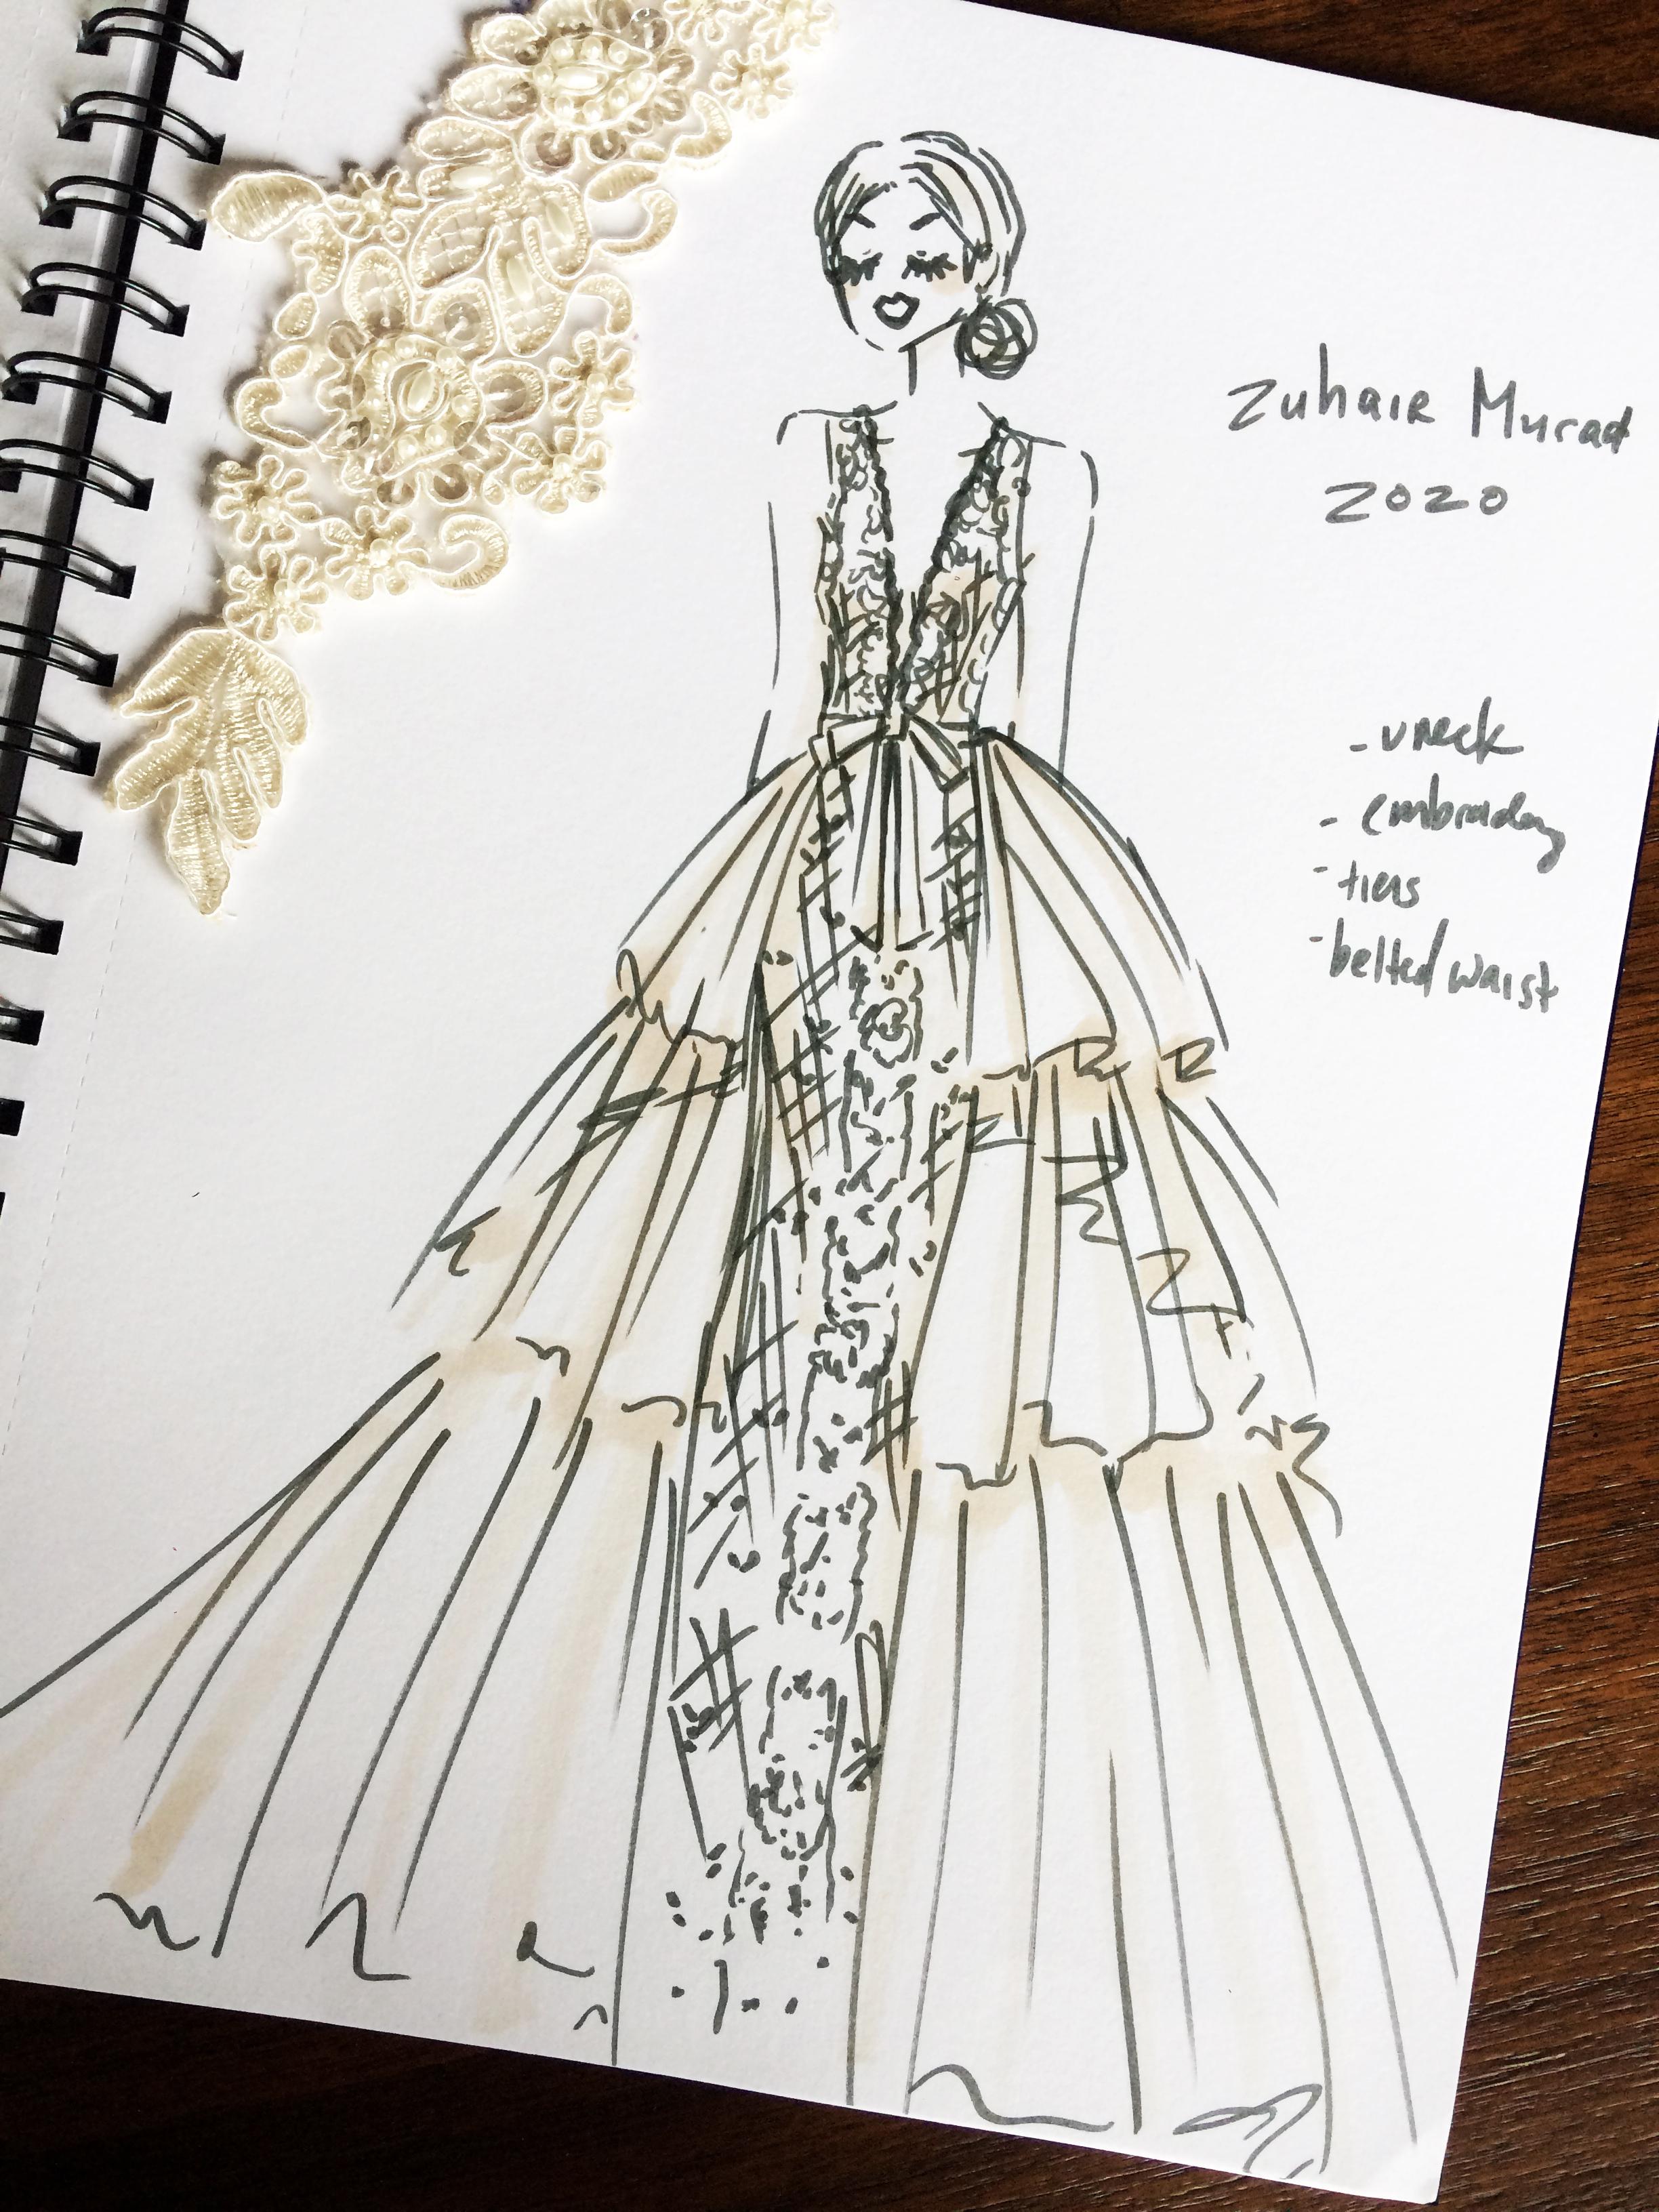 zuhair murad - deanna kei.jpg